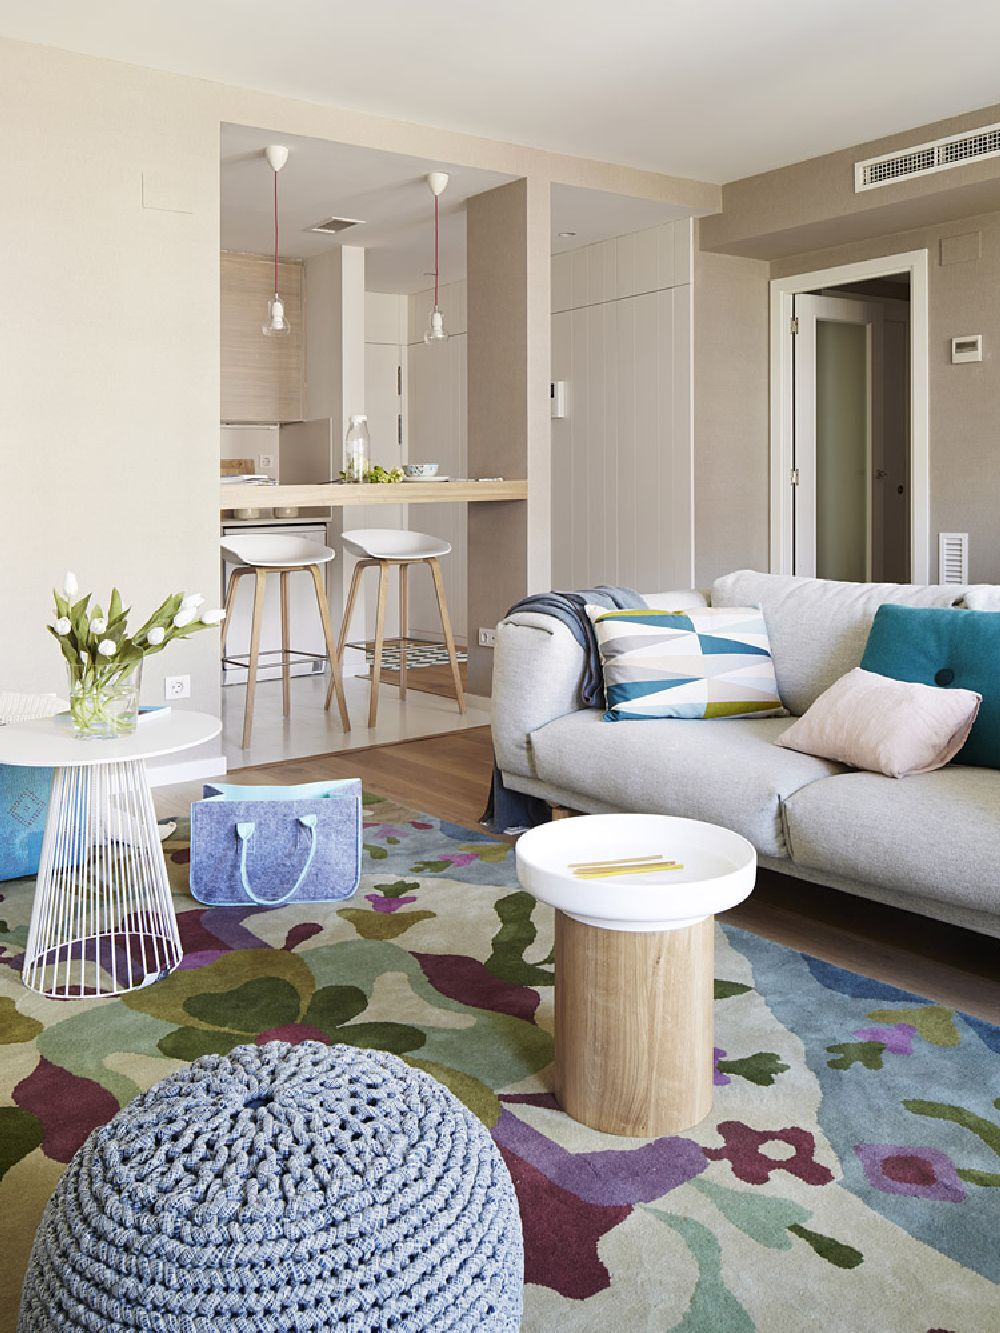 adelaparvu.com despre apartament cu aer mediteranean, design interior Meritxell Ribe (3)